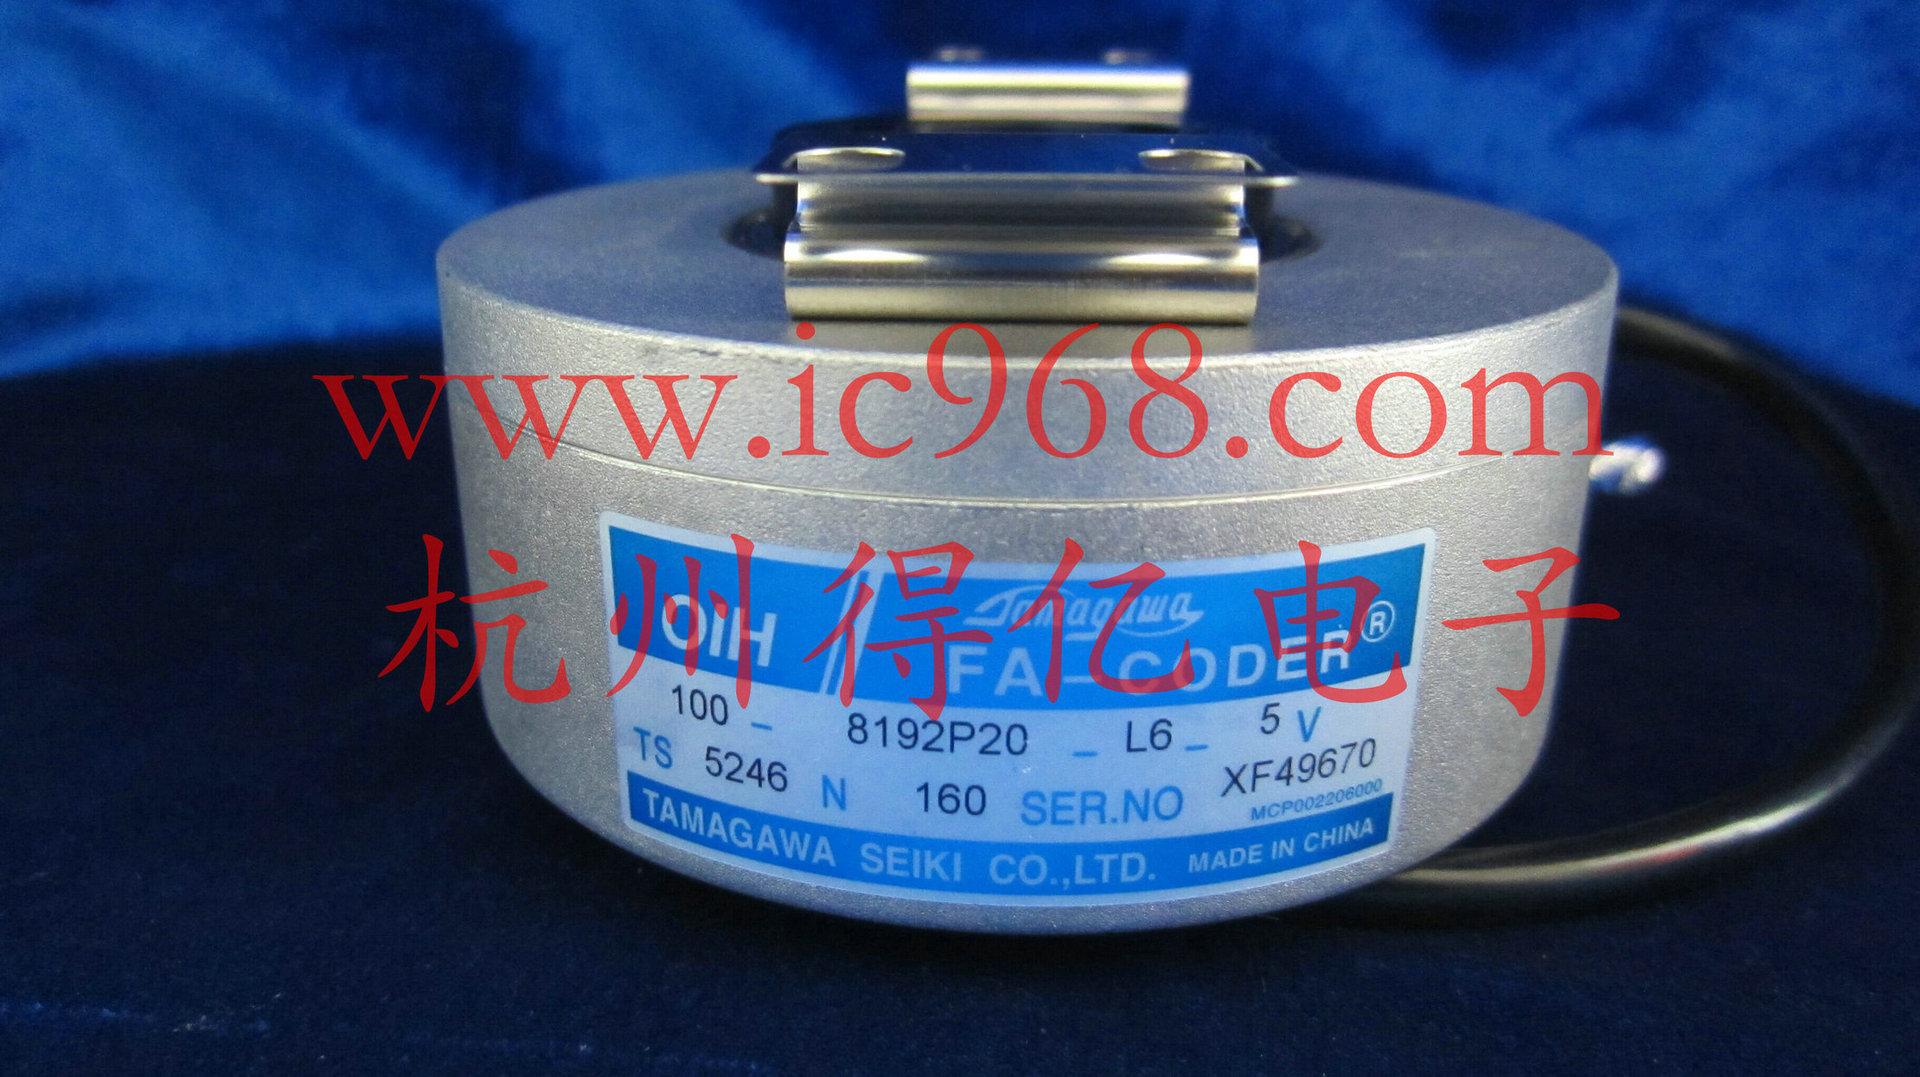 "-1){this.style.display=none;}"" />杭州得亿电子科技有限公司是一家专门开发、研制、生产光、机、电一体化精密检测仪器的高科技企业,专长于工业传感器、检测及自动化技术产品。代理品牌:日本:内密控NEMICON、光洋KOYO、多摩川Tamagawa、欧姆龙OMRON、莱茵LINE、MTL、东测TOSOKU、森泰克SUMTAK、日控NATEC韩国:奥托尼克斯Autonics、韩荣Hanyoungnux德国:倍加福PF、海德汉Heidenhain、图尔克Turck、亨士乐H"